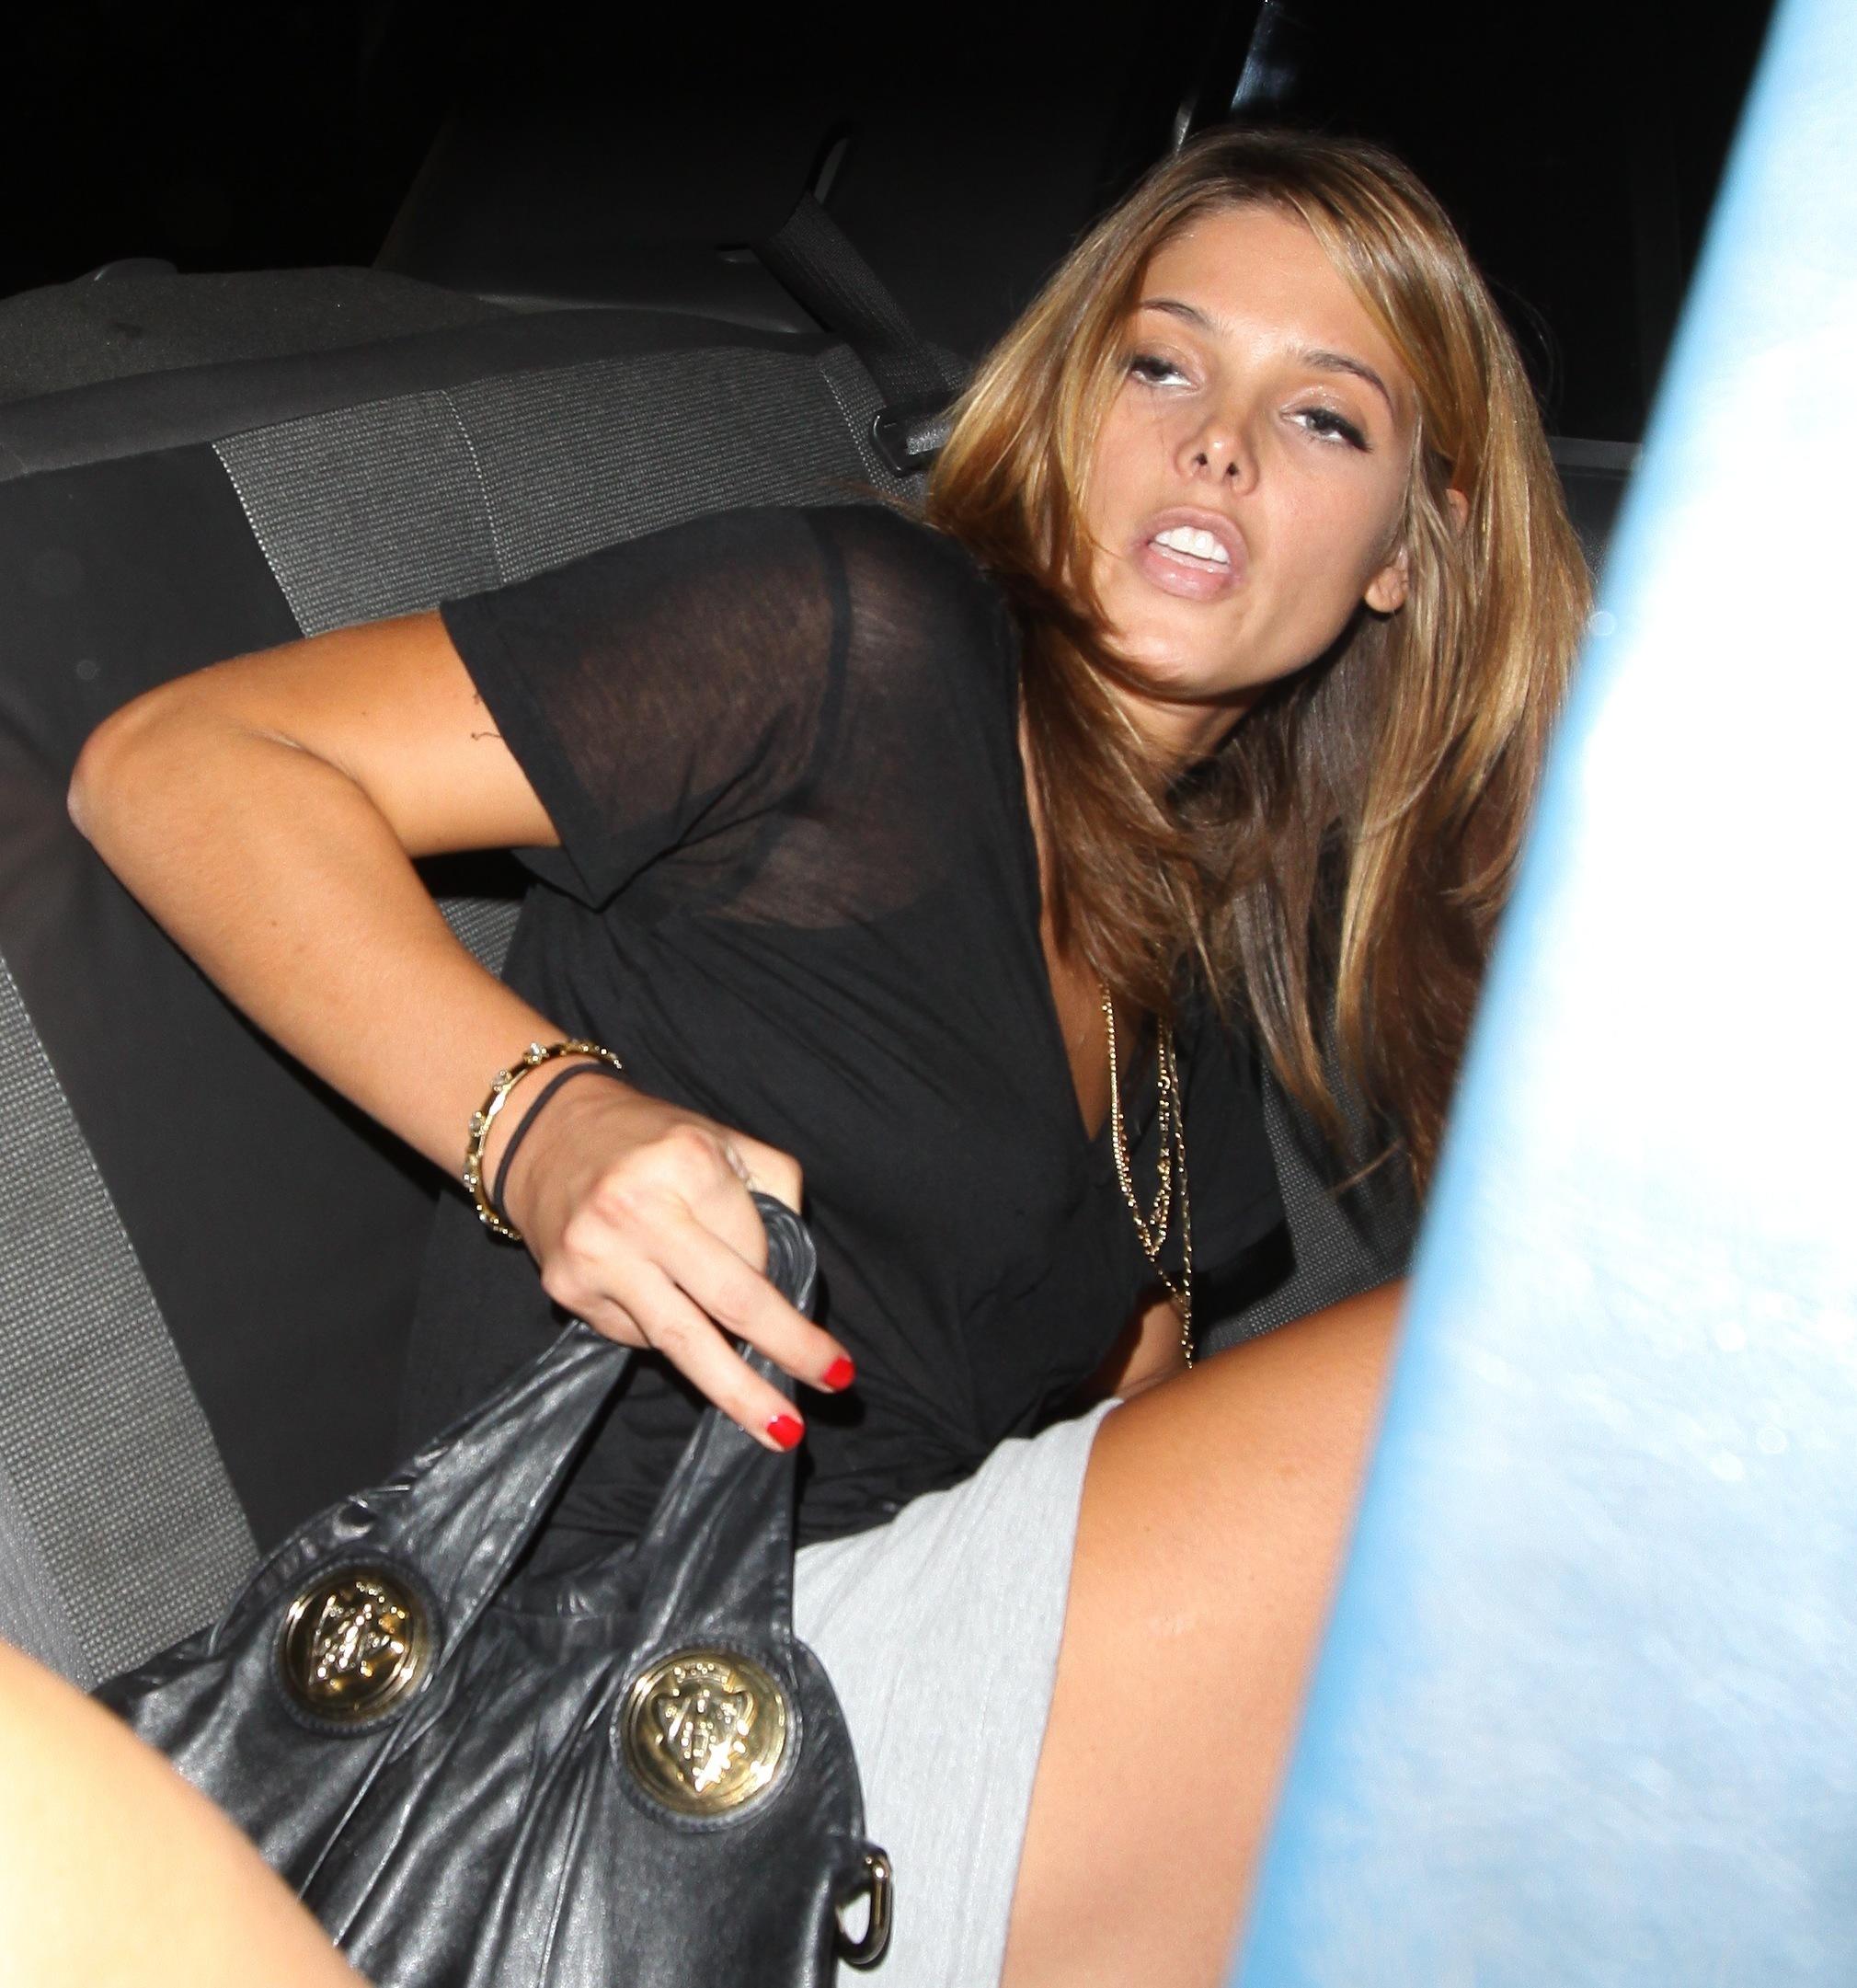 Ashley leaving Premiere Nightclub 09-09-10